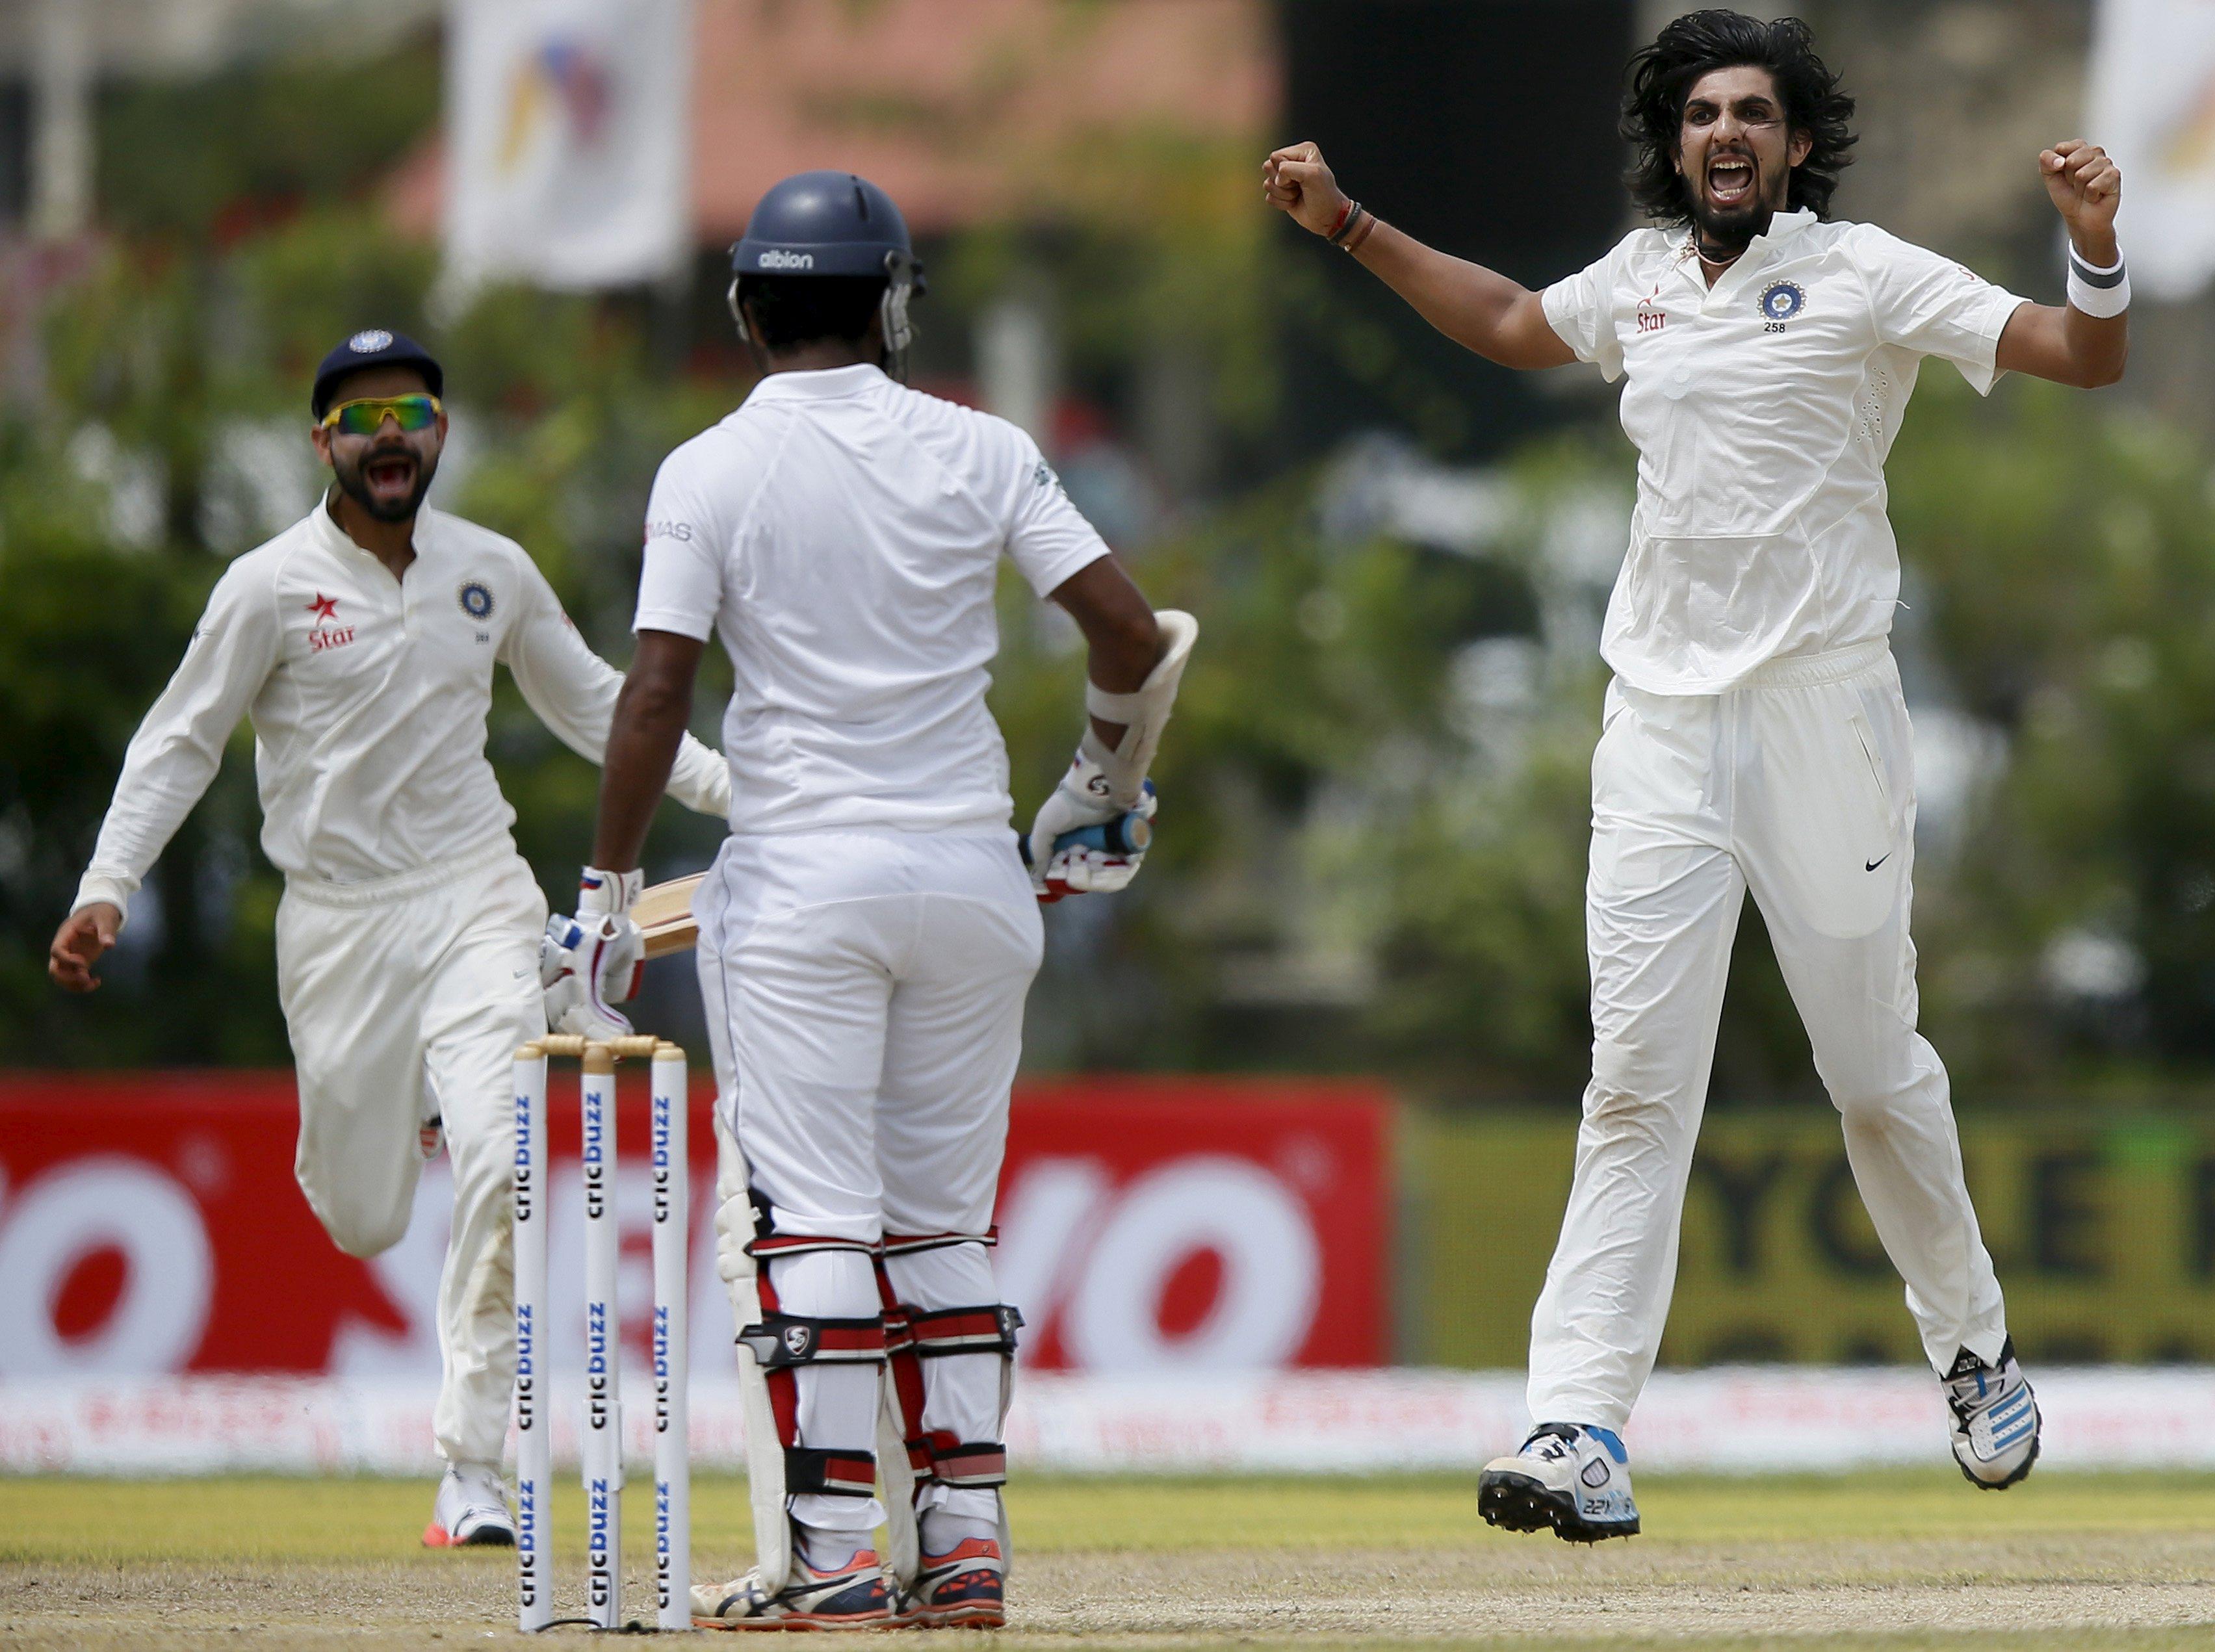 India's Ishant Sharma